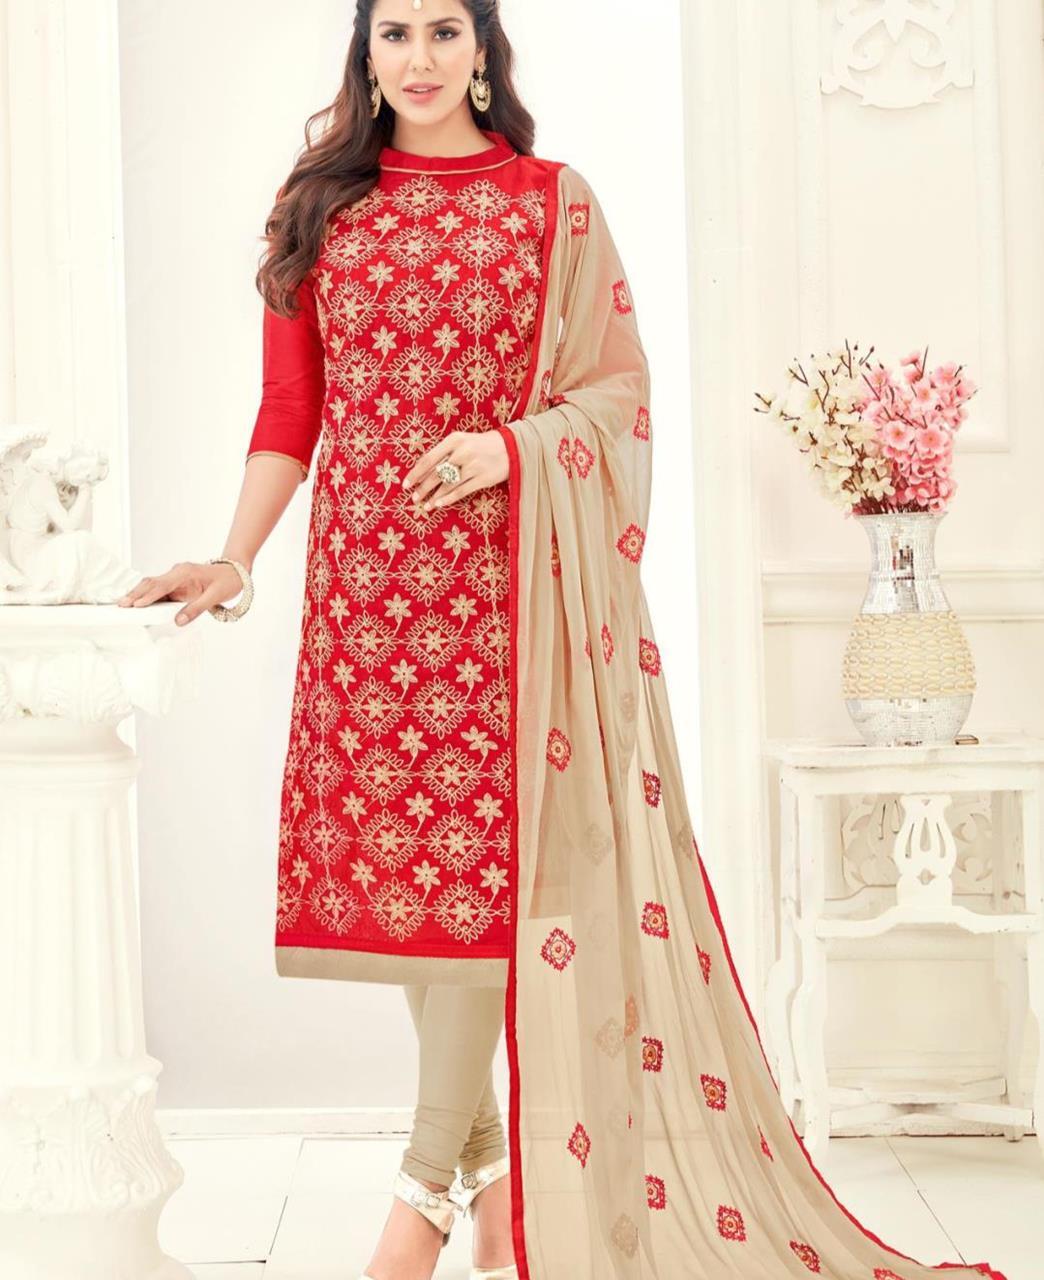 Embroidered Chanderi Red Straight Cut Salwar Kameez